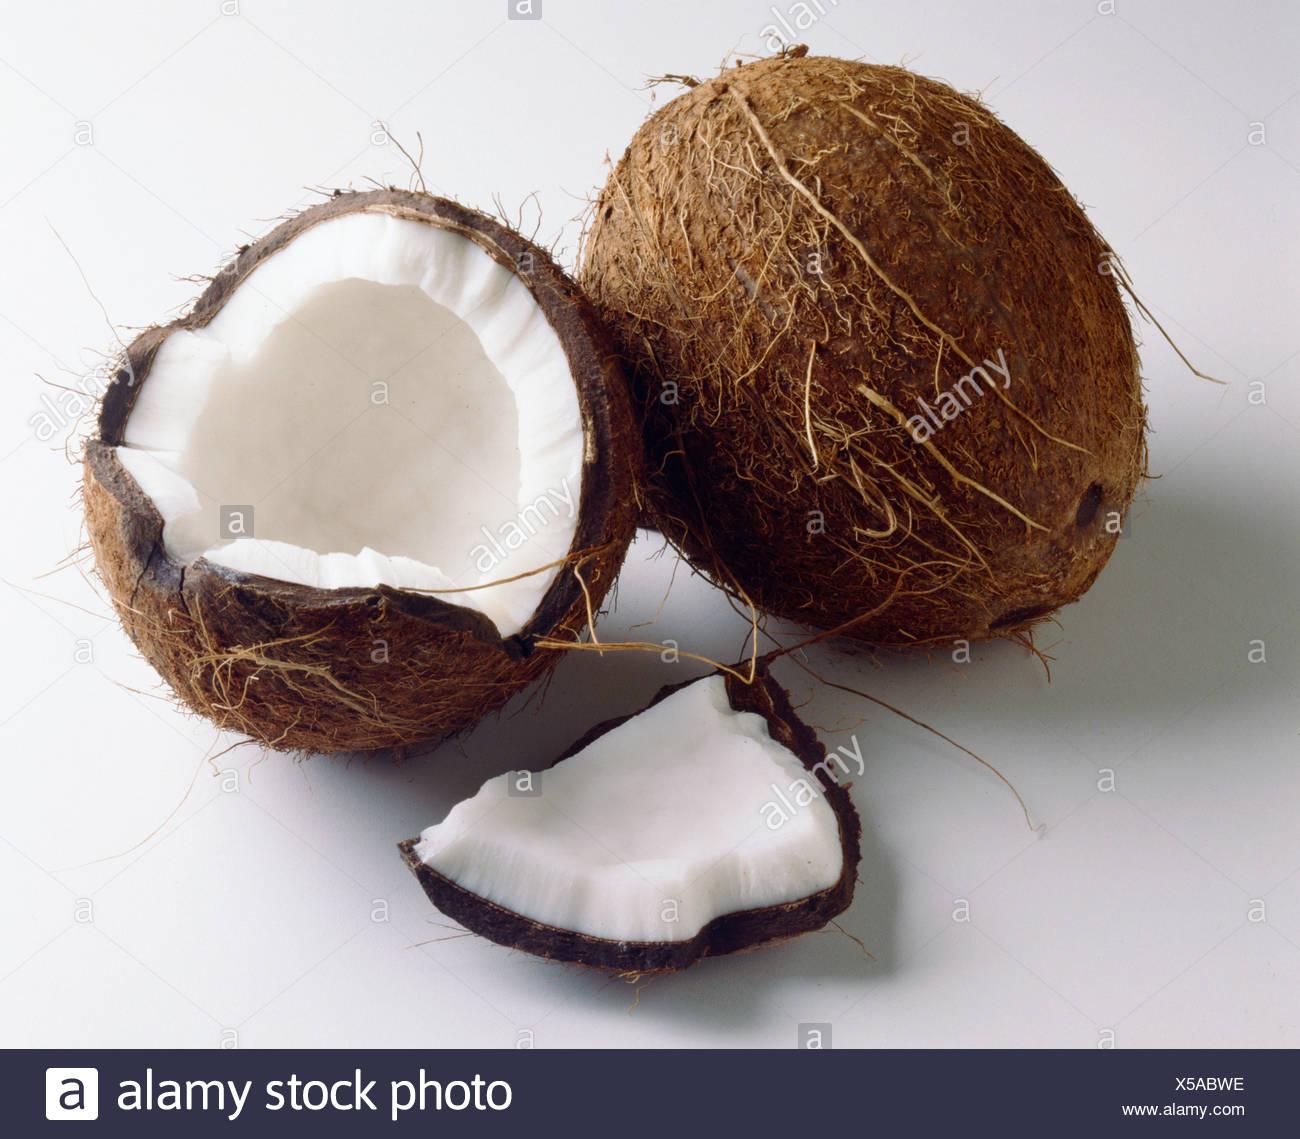 Coconuts - Stock Image